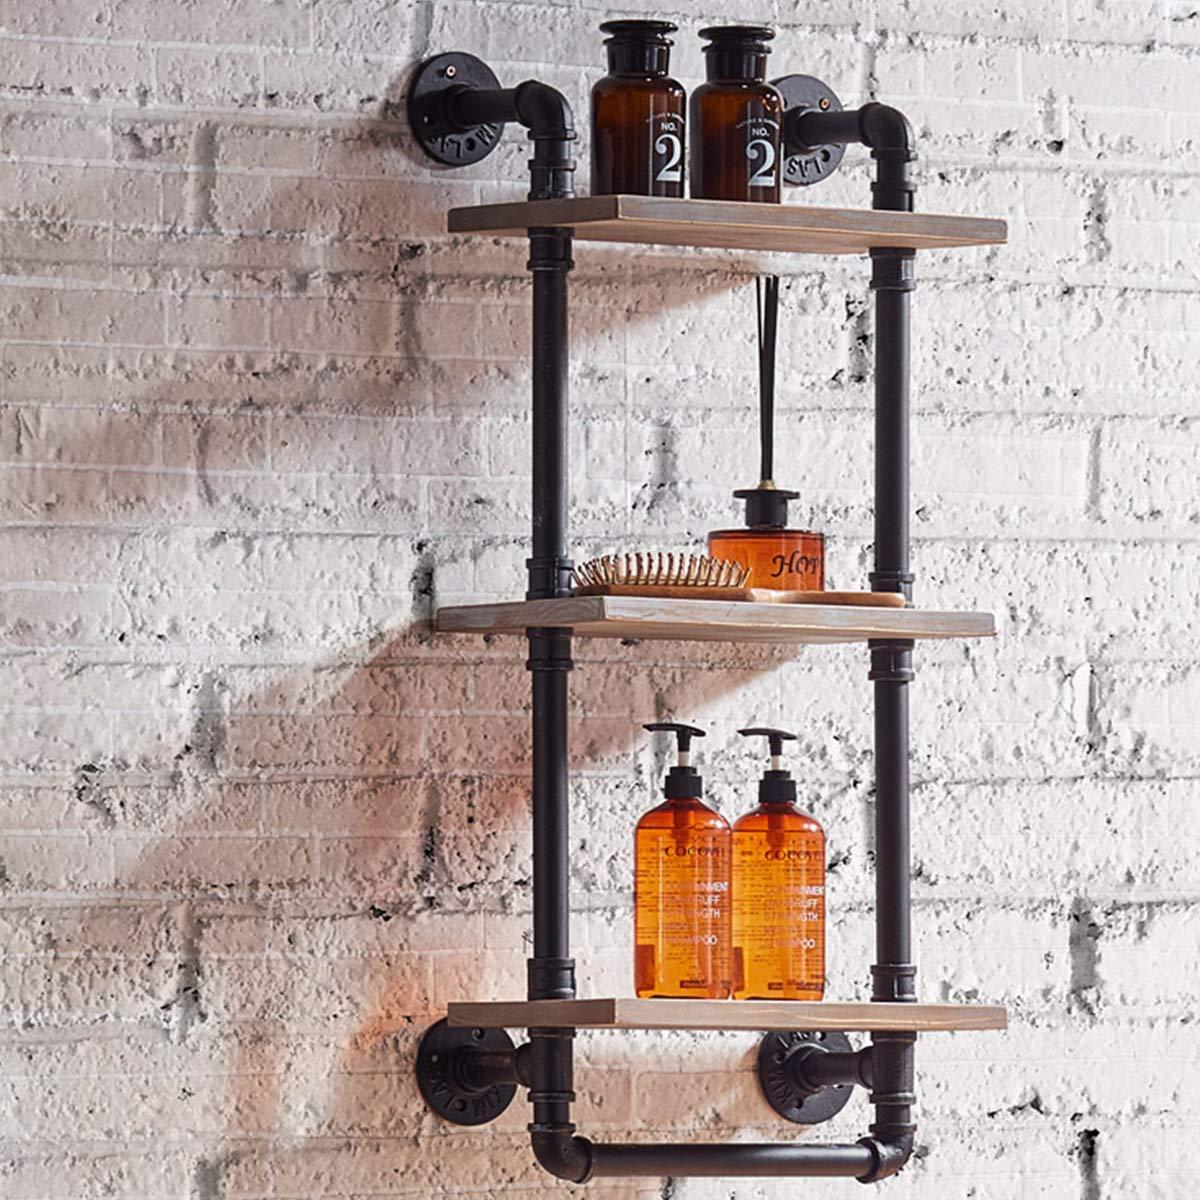 Warm Van Industrial Pipe & Wood Wall Mount Shelves,Retro Clapboard Tool Shelf,Bathroom Kitchen Accessories Storage Cabinet,Towel Rack